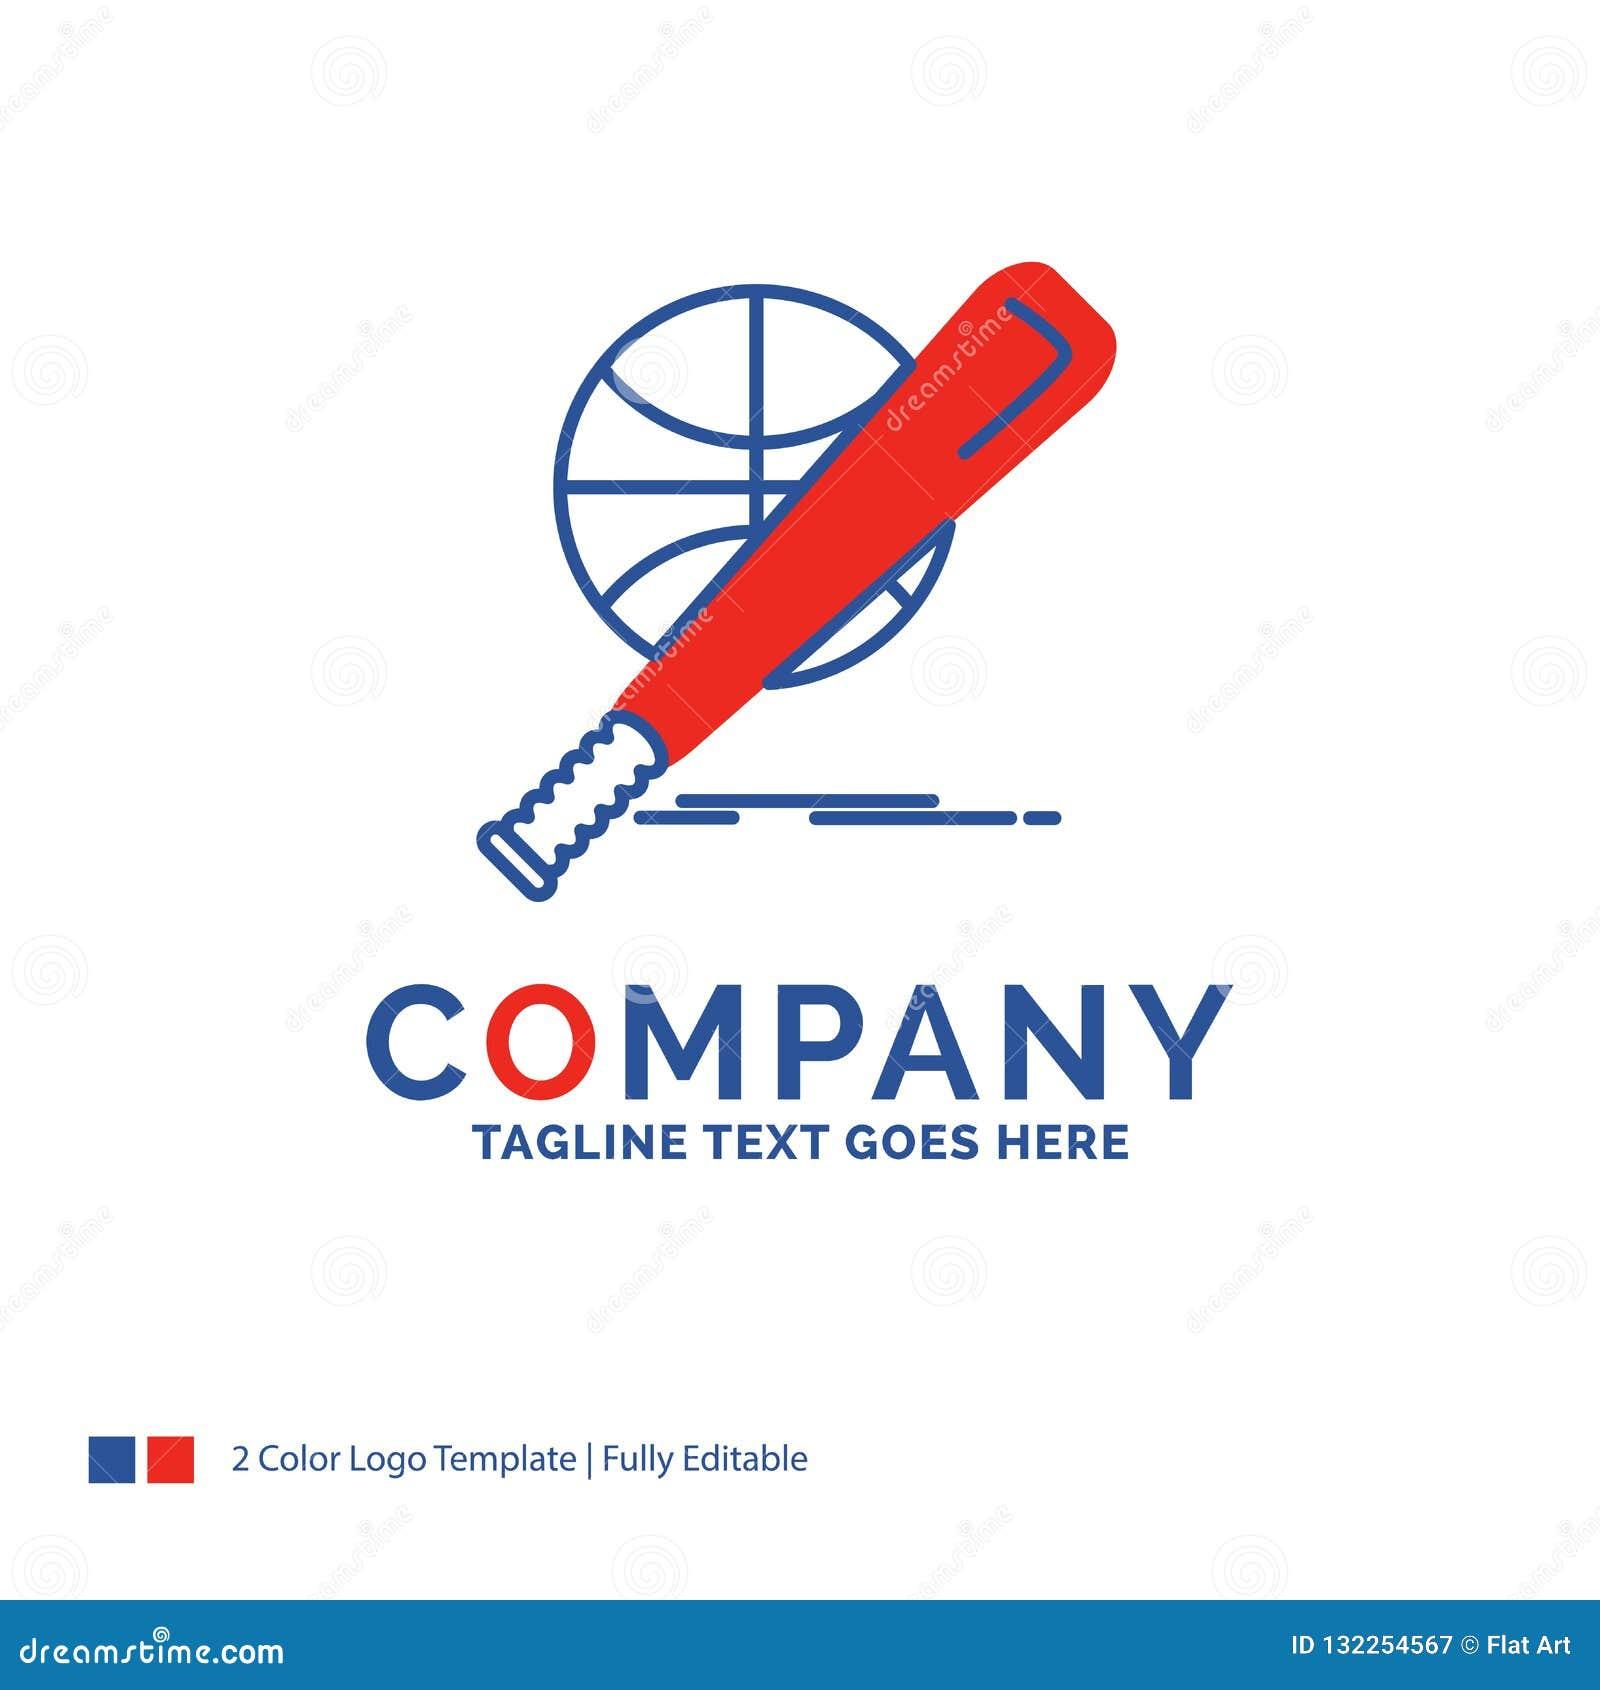 Béisbol de Logo Design For del nombre de compañía, cesta, bola, juego, diversión